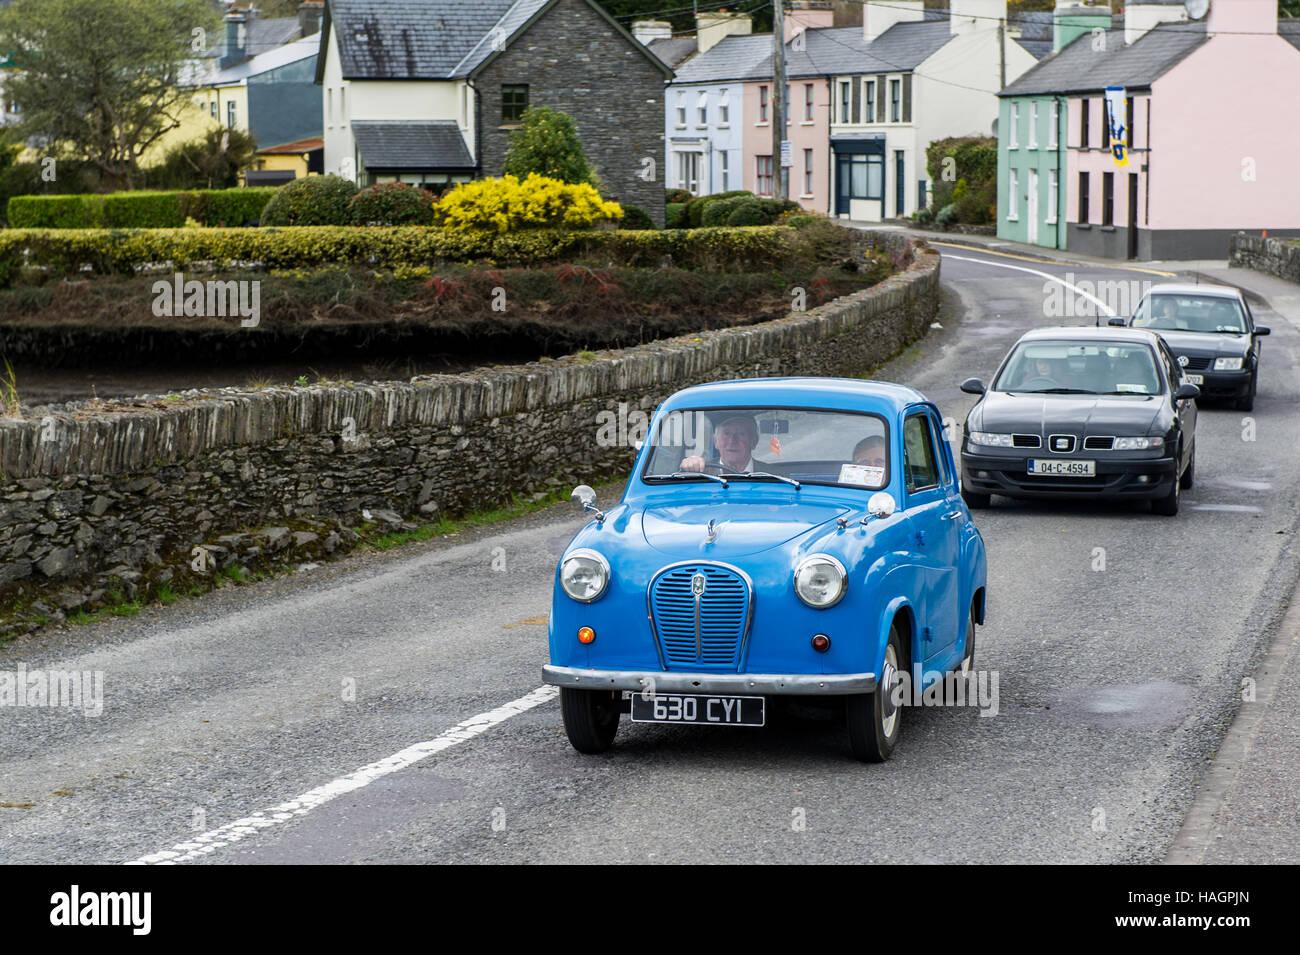 an-old-blue-austin-car-crosses-ballydehob-bridge-west-cork-ireland-HAGPJN.jpg